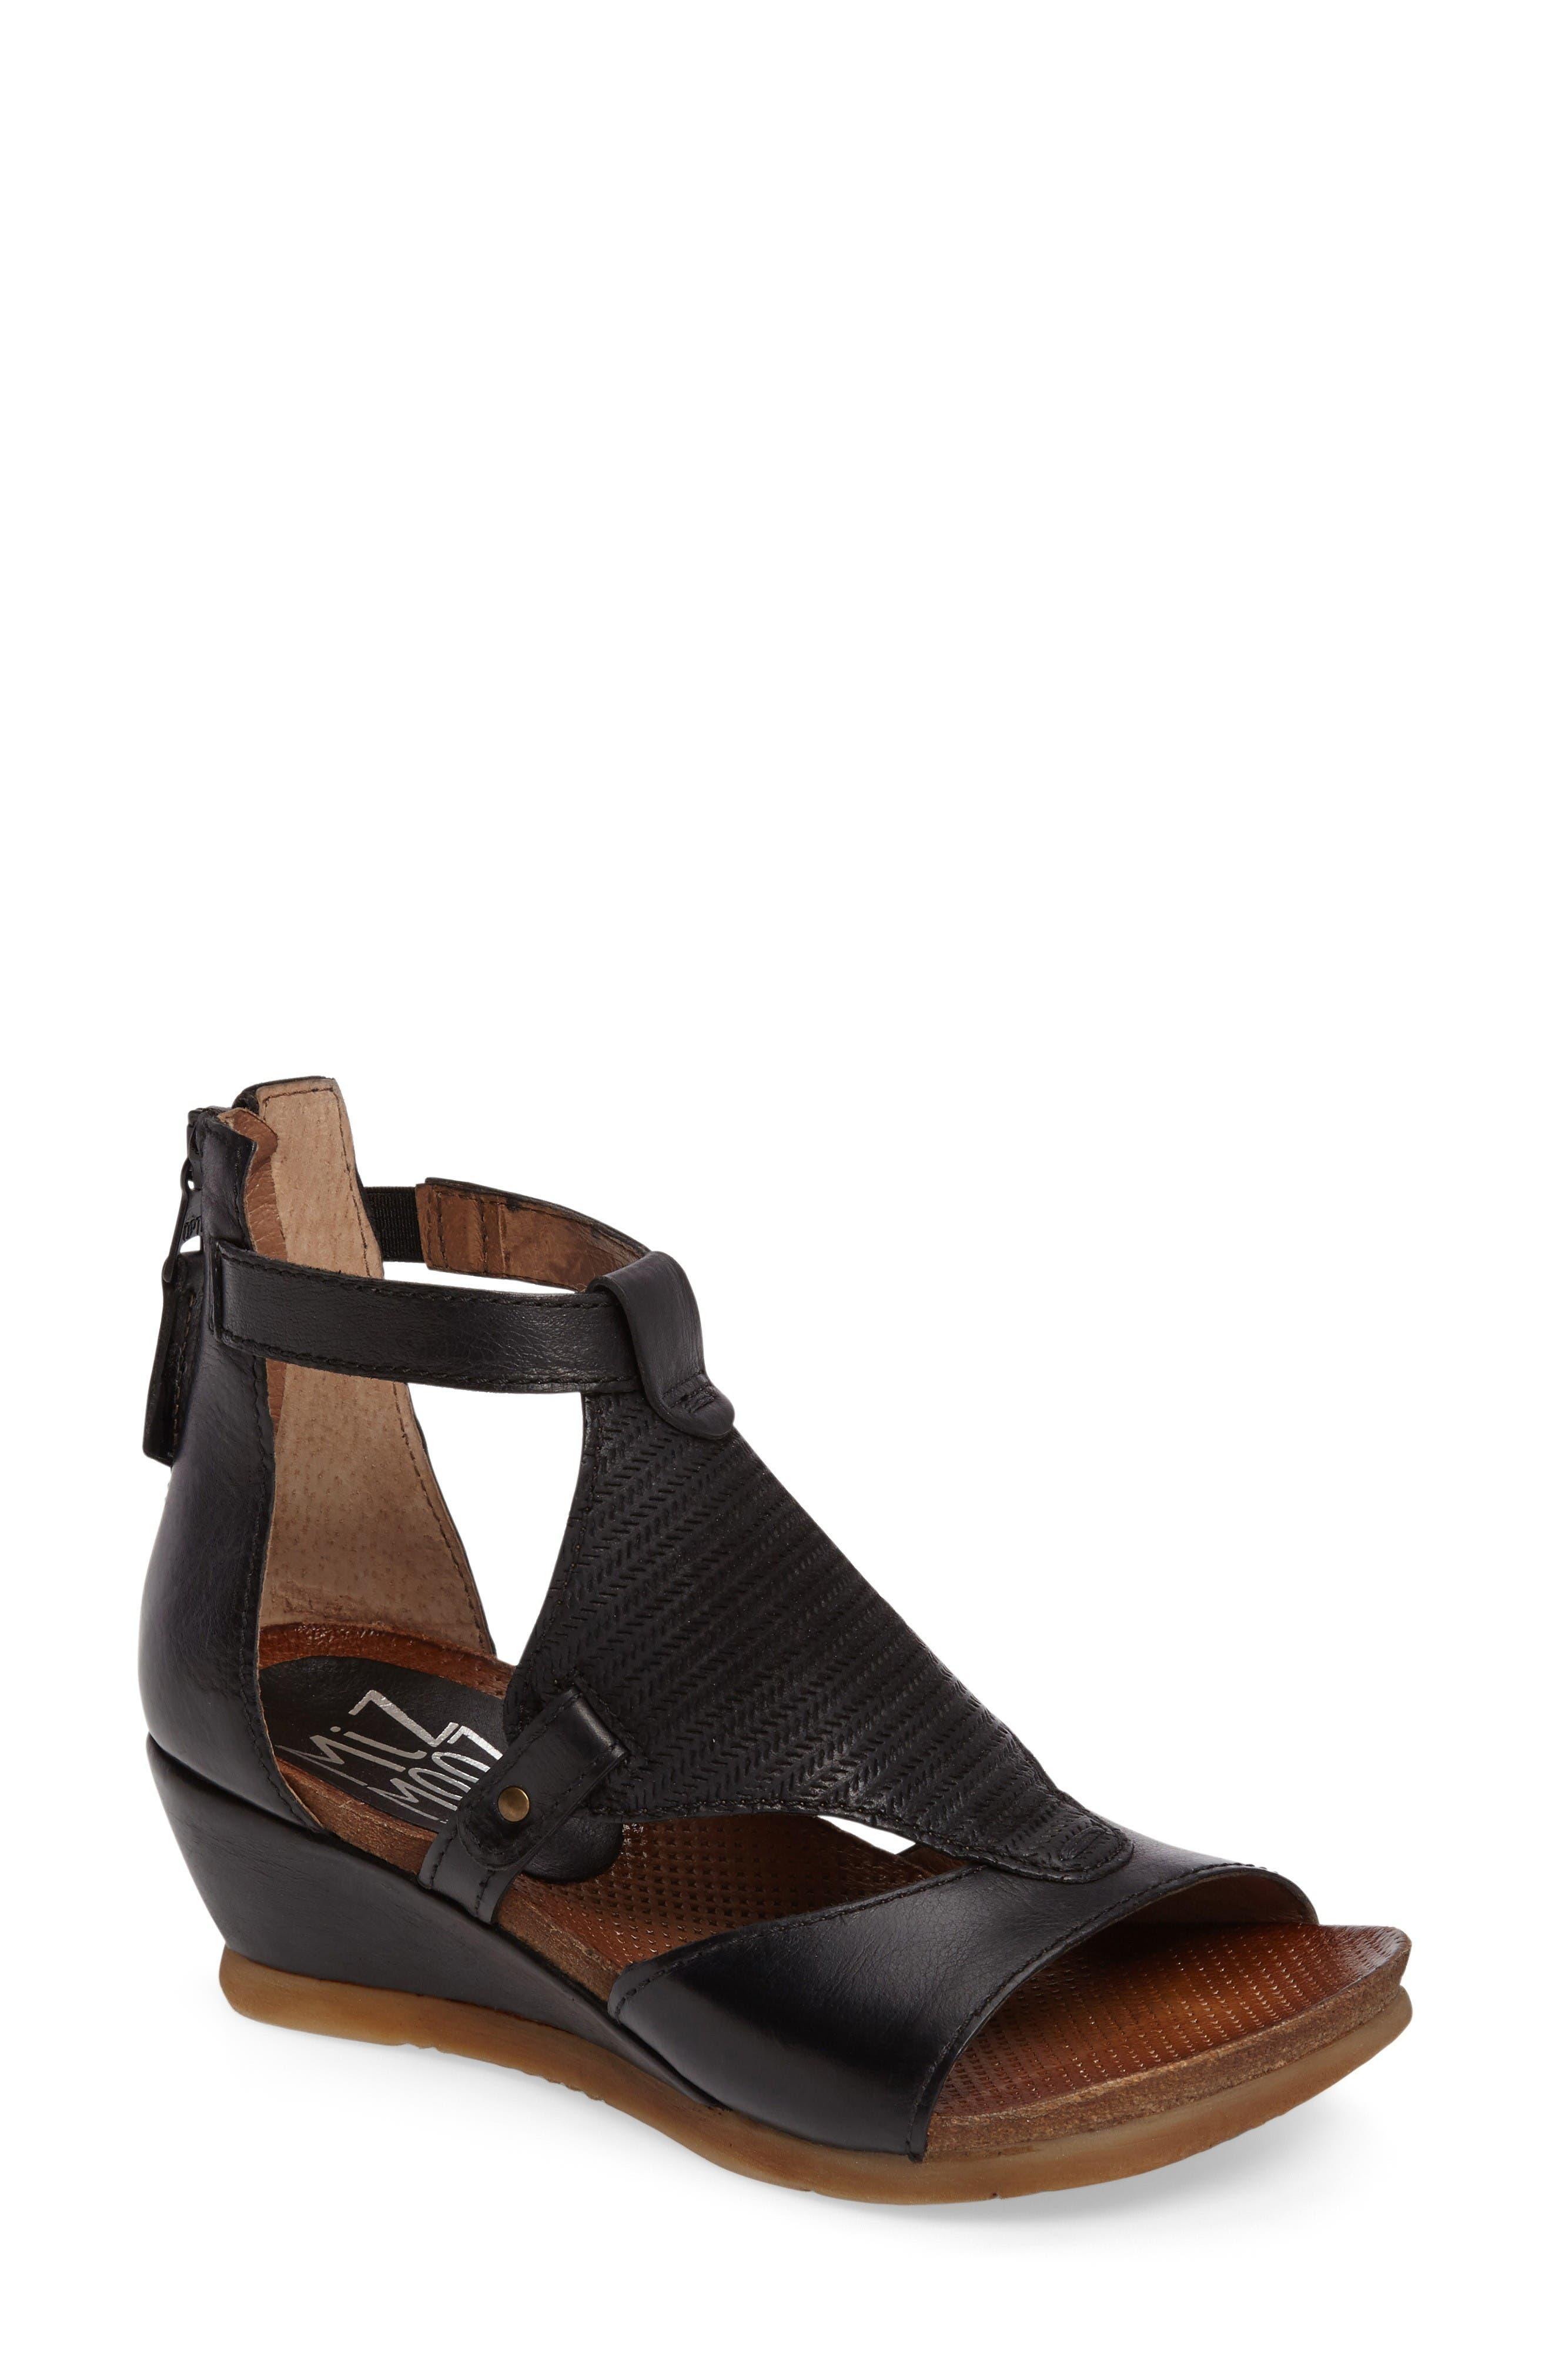 Miz Mooz Maisie Wedge Sandal (Women)